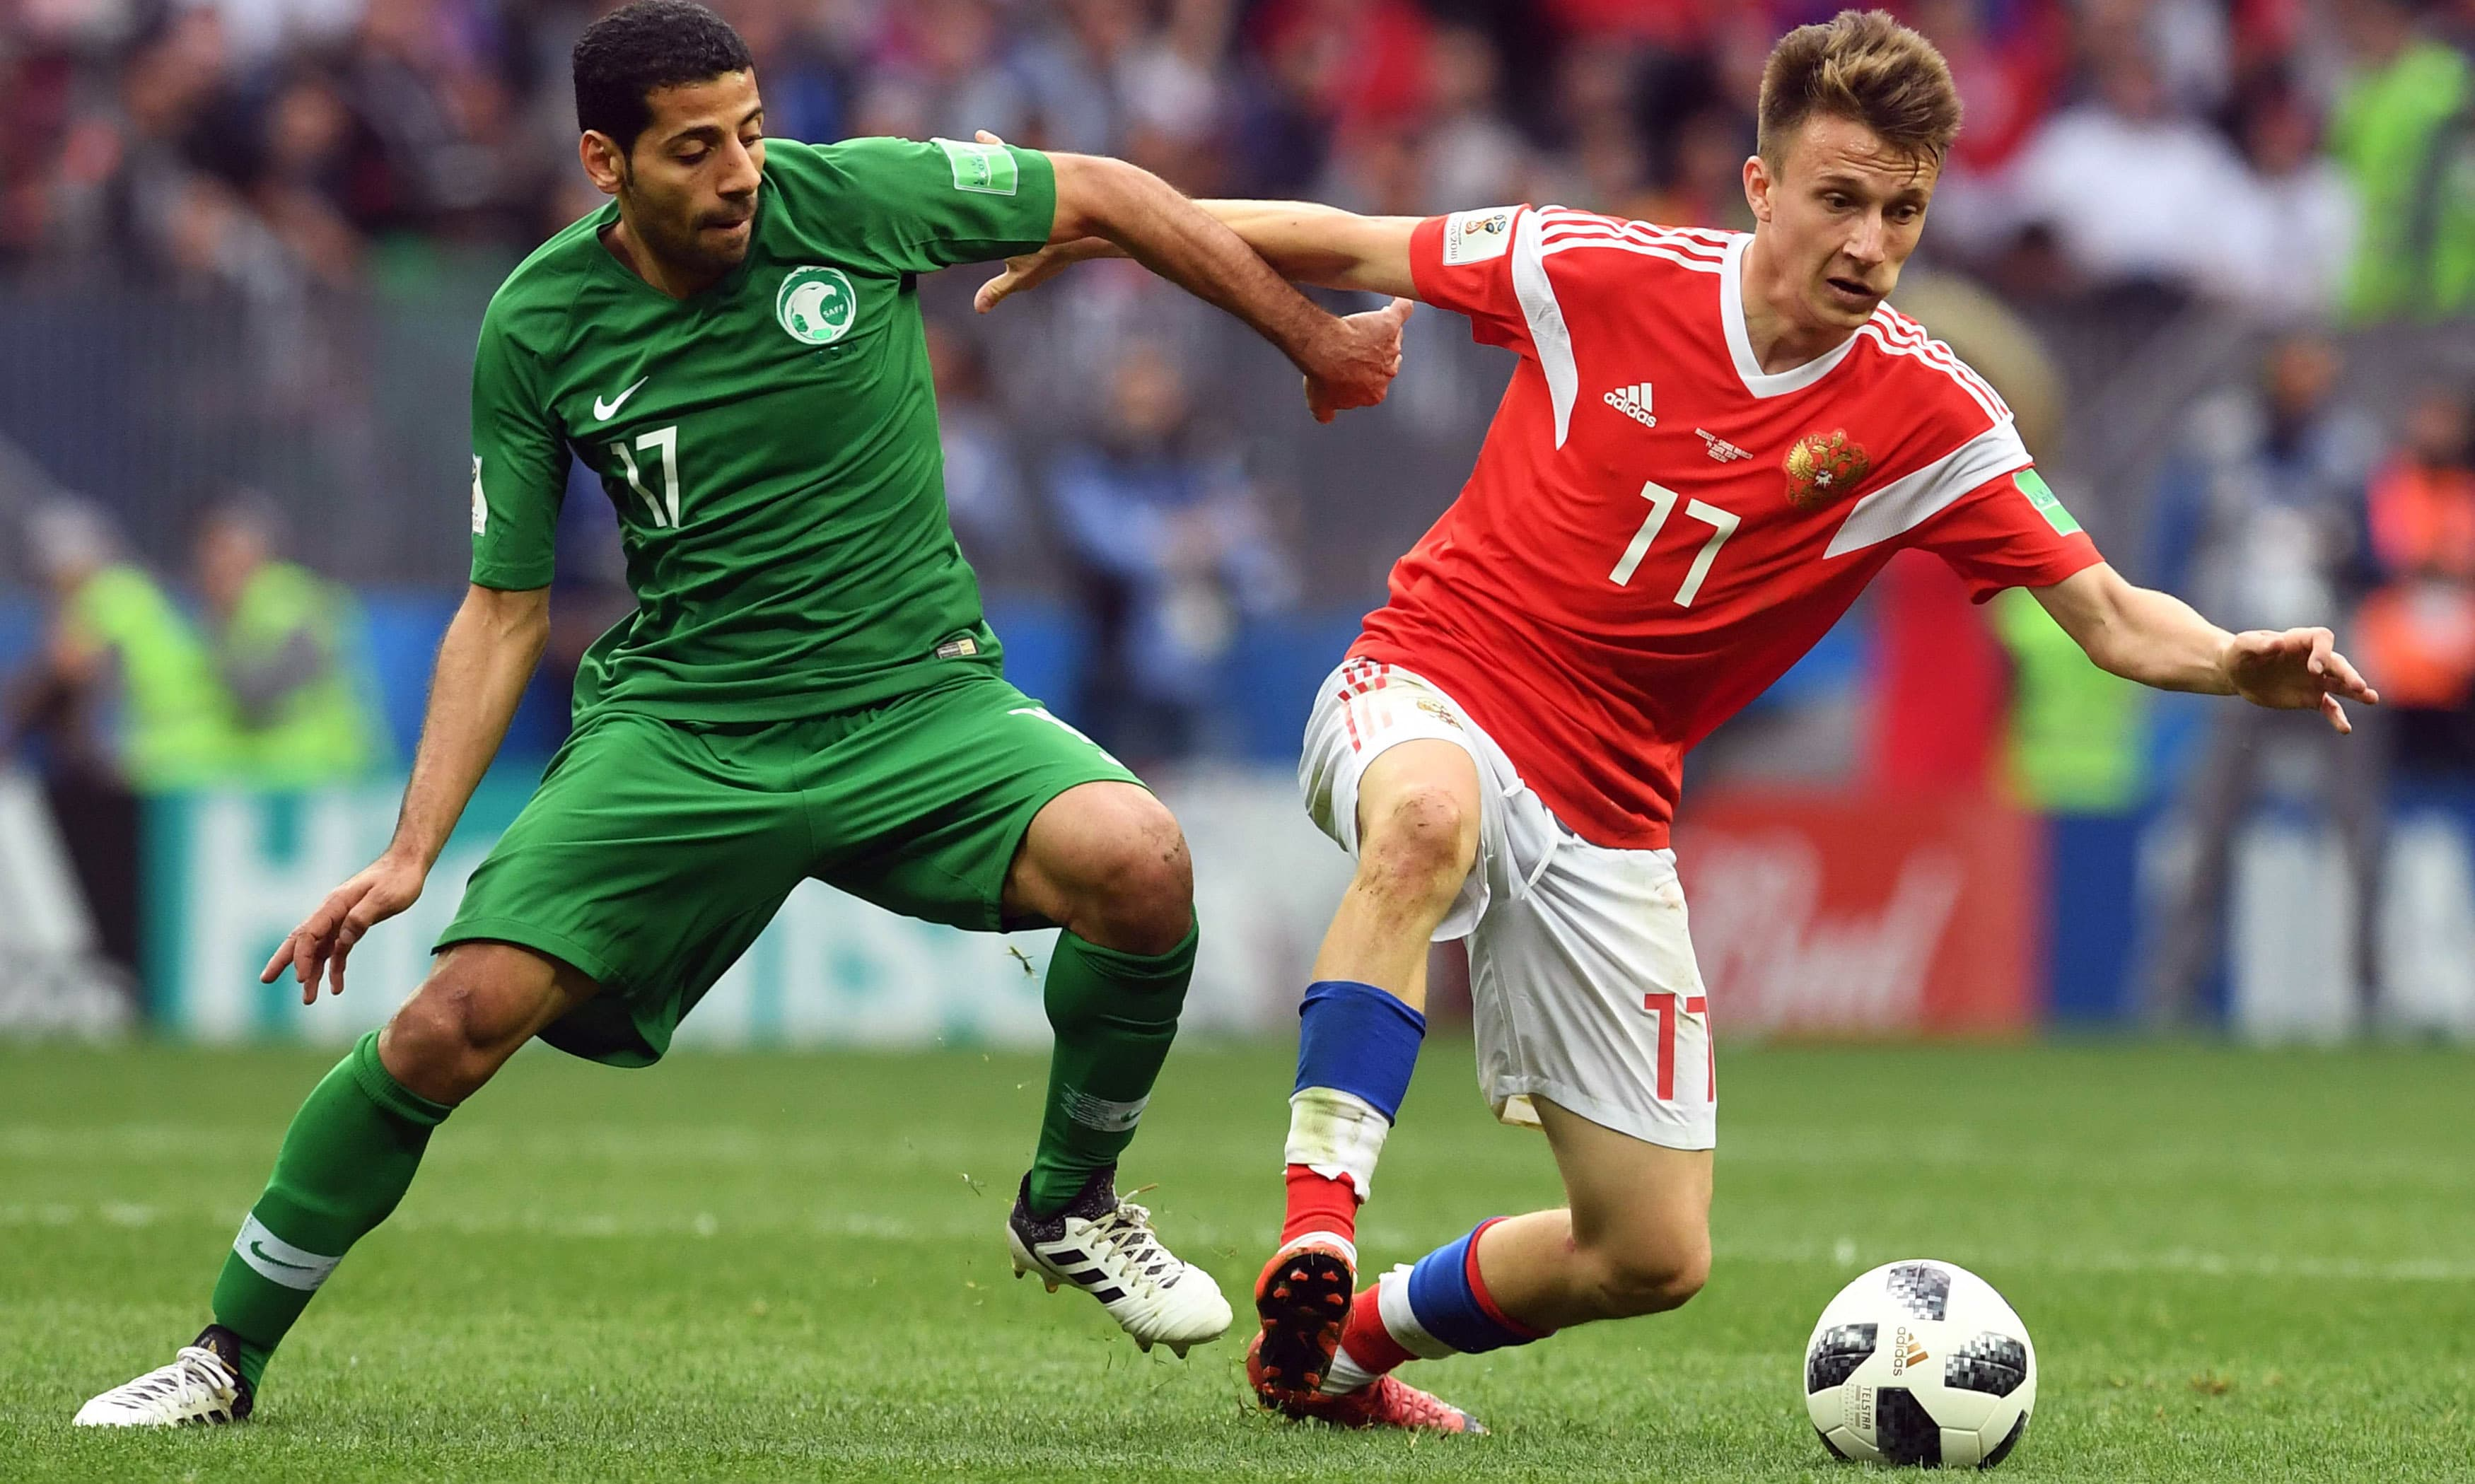 Taisir Al-Jassim vies with Russia's midfielder Aleksandr Golovin. —AFP